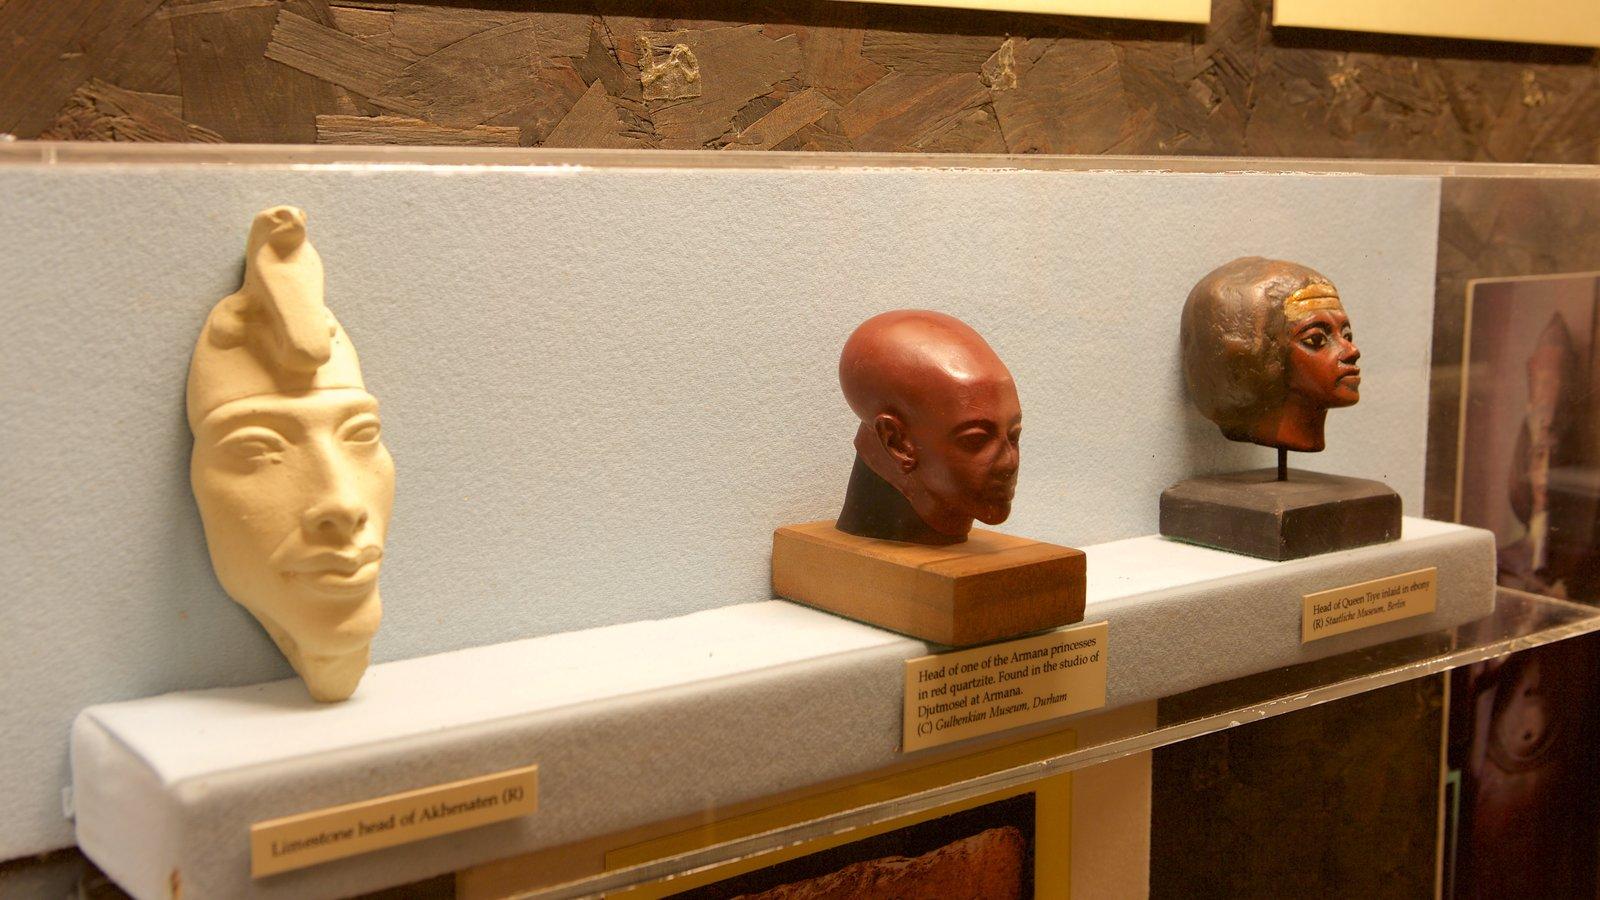 Tutankamon a exposição caracterizando uma estátua ou escultura